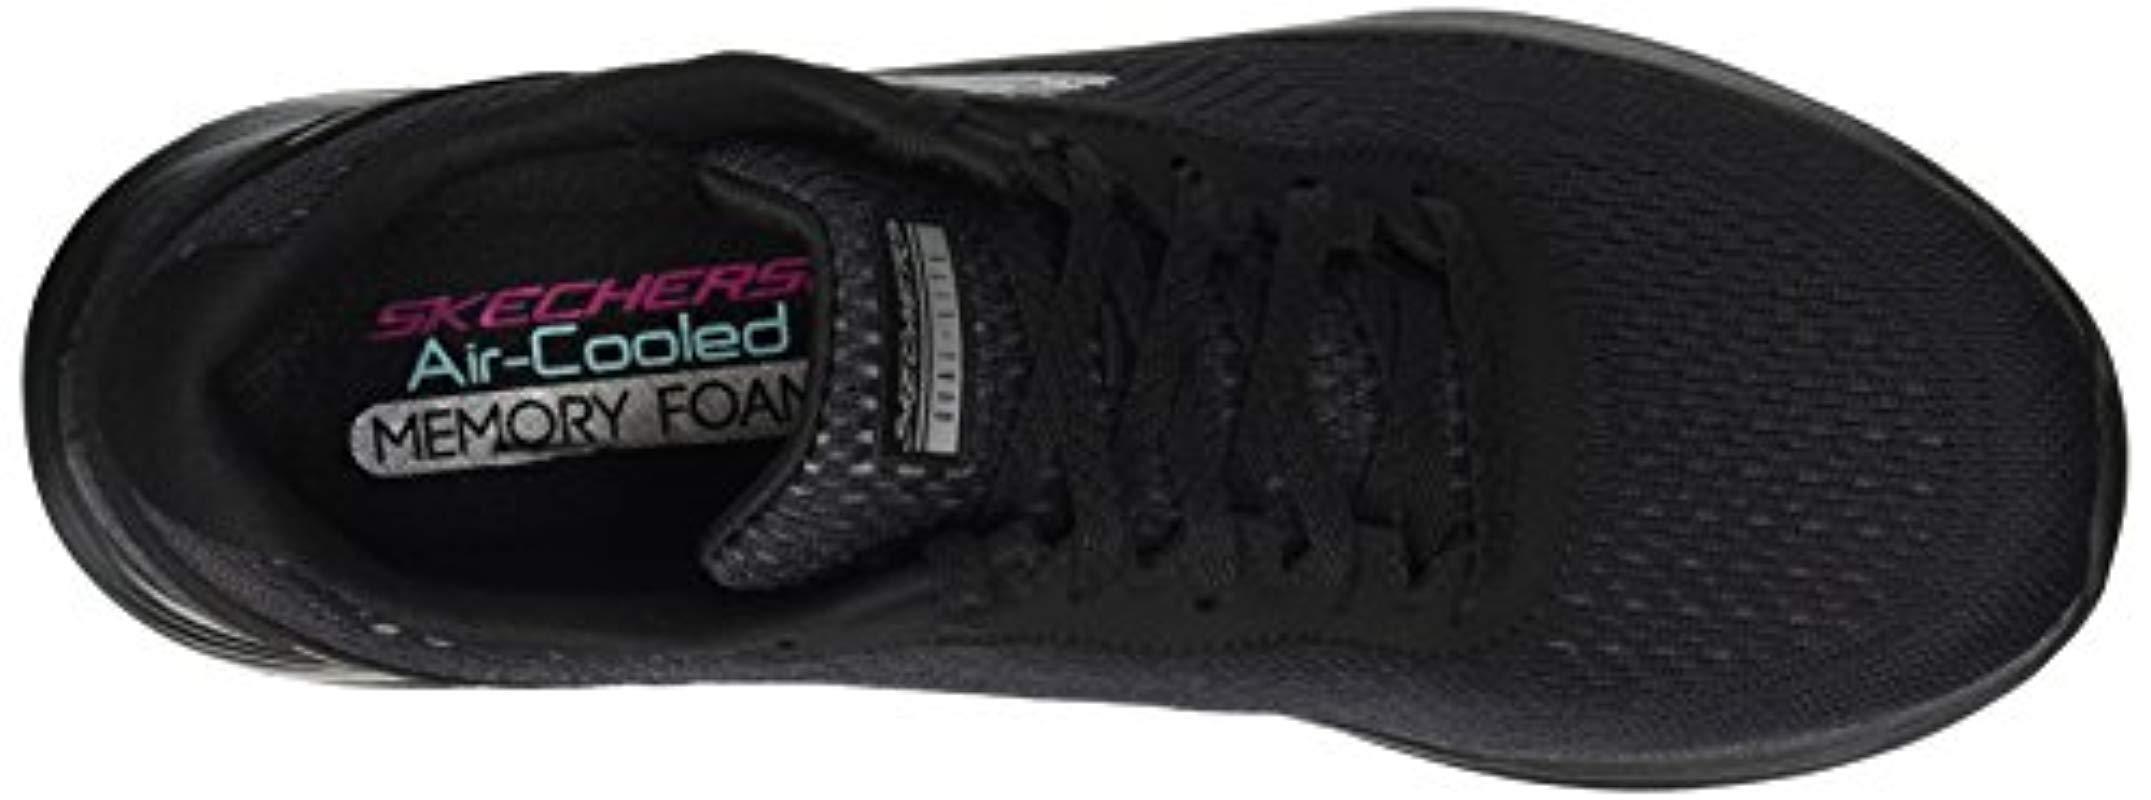 Skechers Sport Skyline Sneaker,black Bbk,5.5 M Us